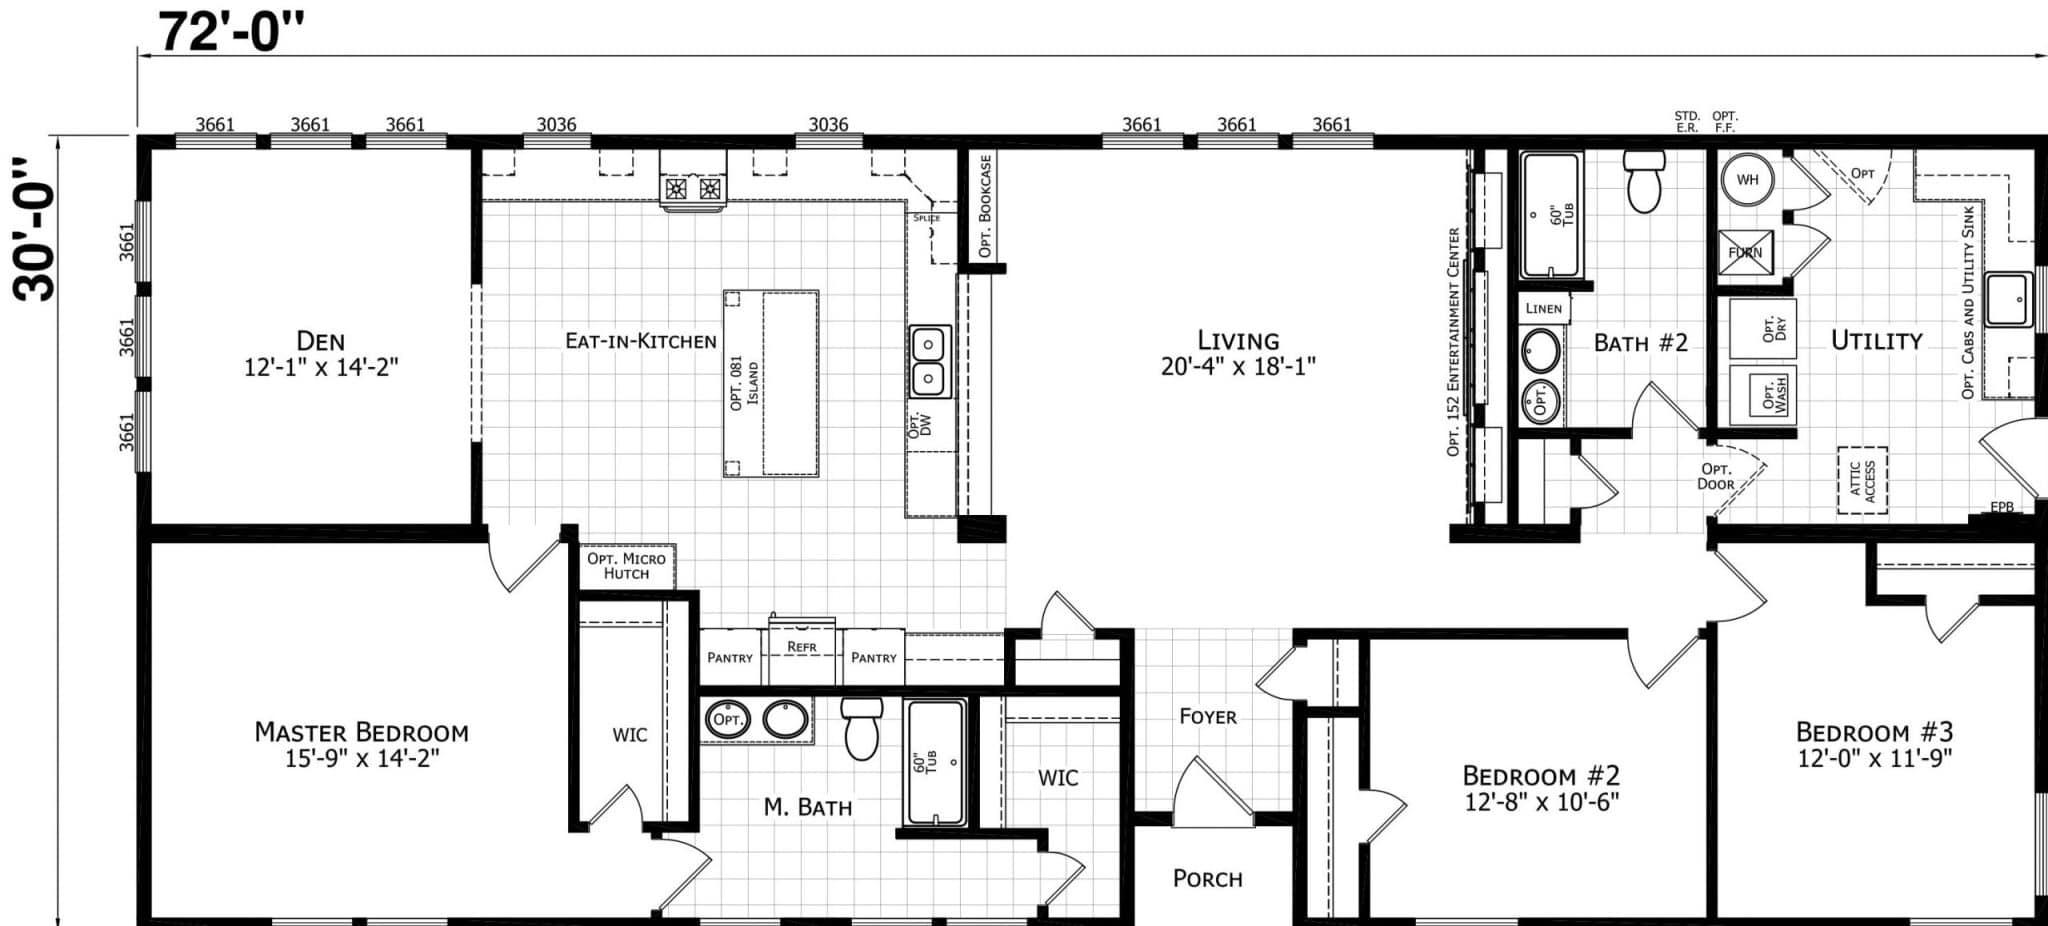 Champion-3276-211-Floor-plan-scaled.jpg